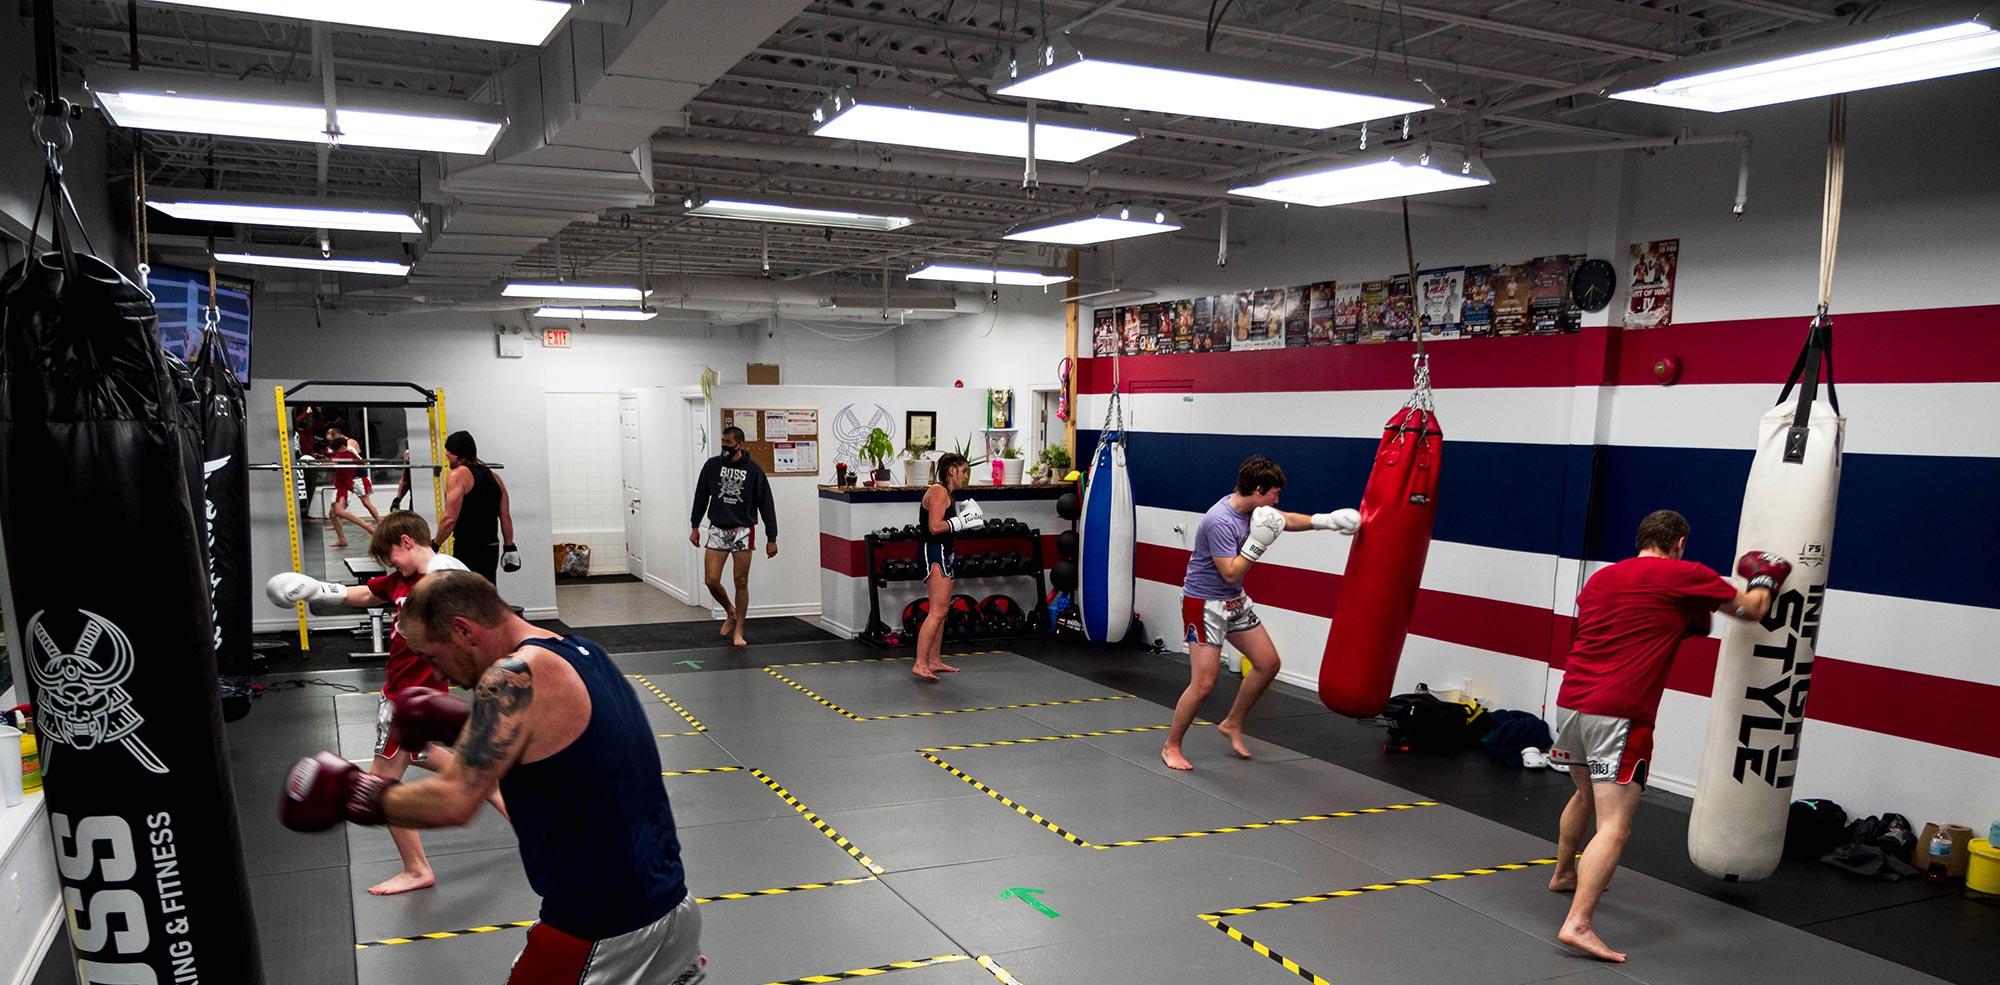 Muay Thai class in action with Kru Yuki individual bag training